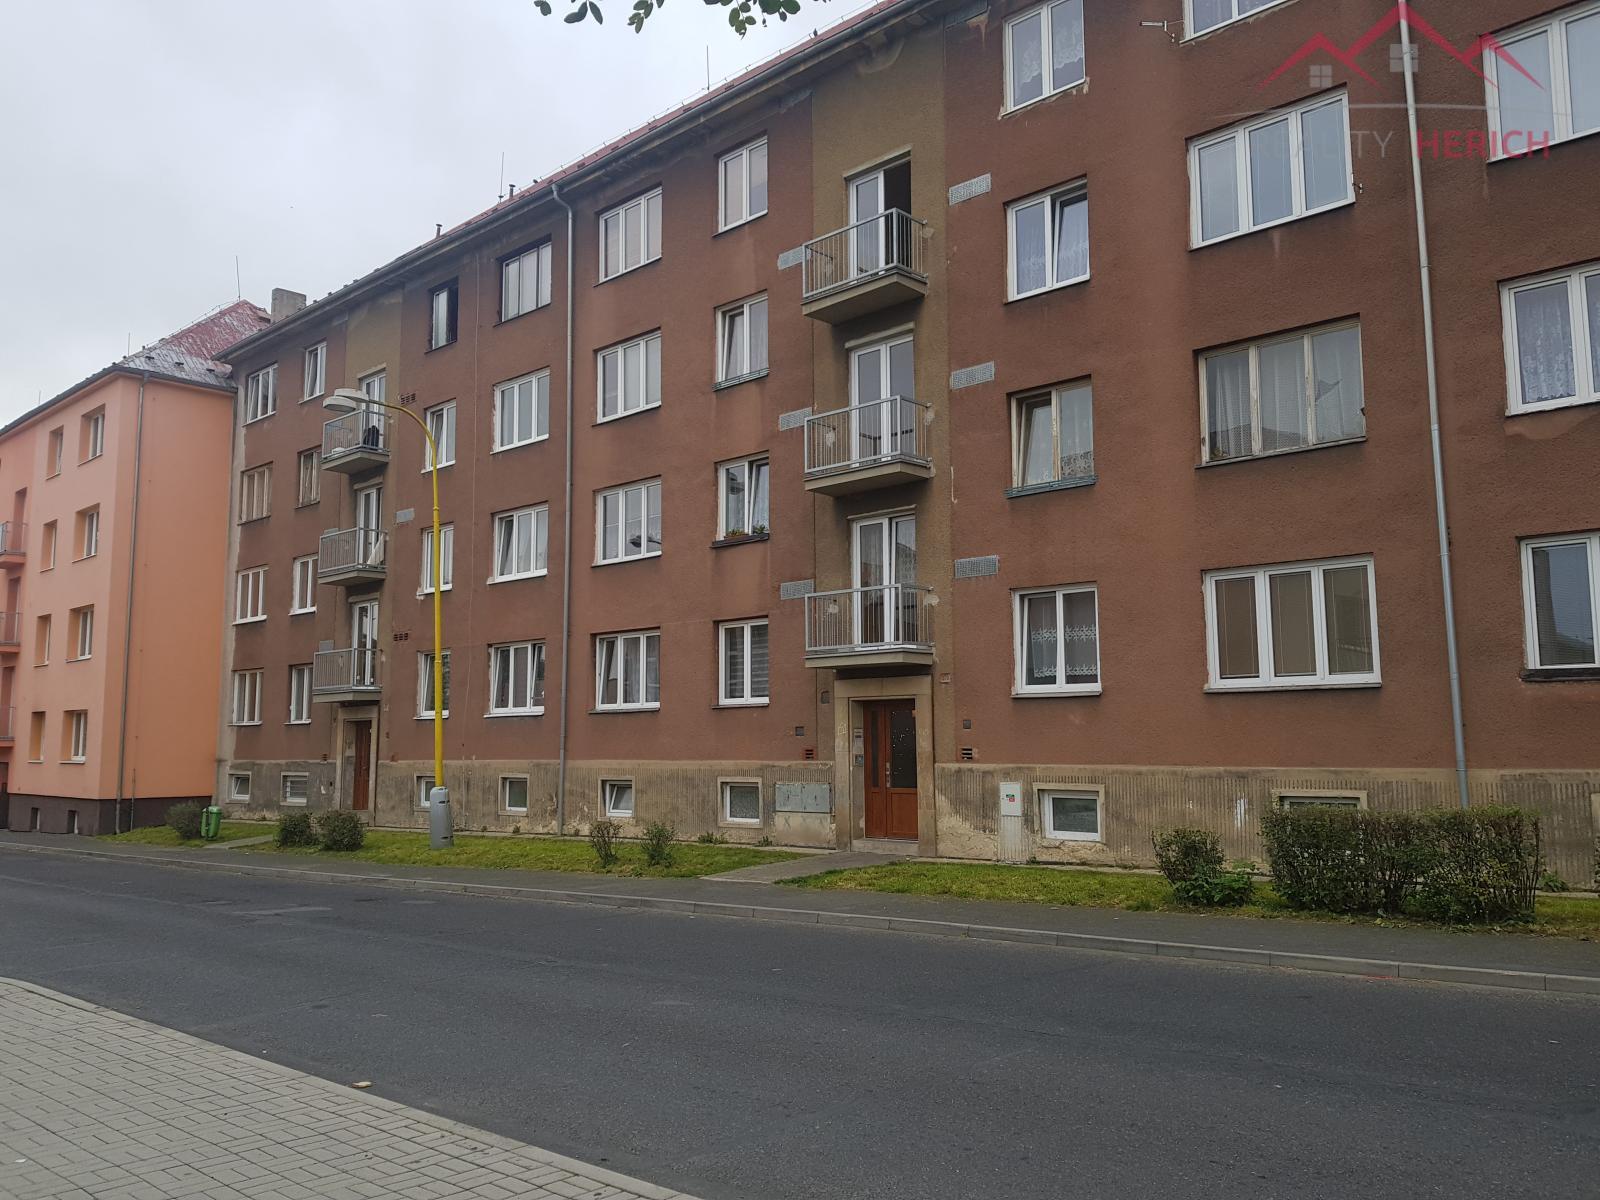 Pronájem bytu 2+1 s balkónem, 51 m2, ulice Karla Čapka, Jirkov